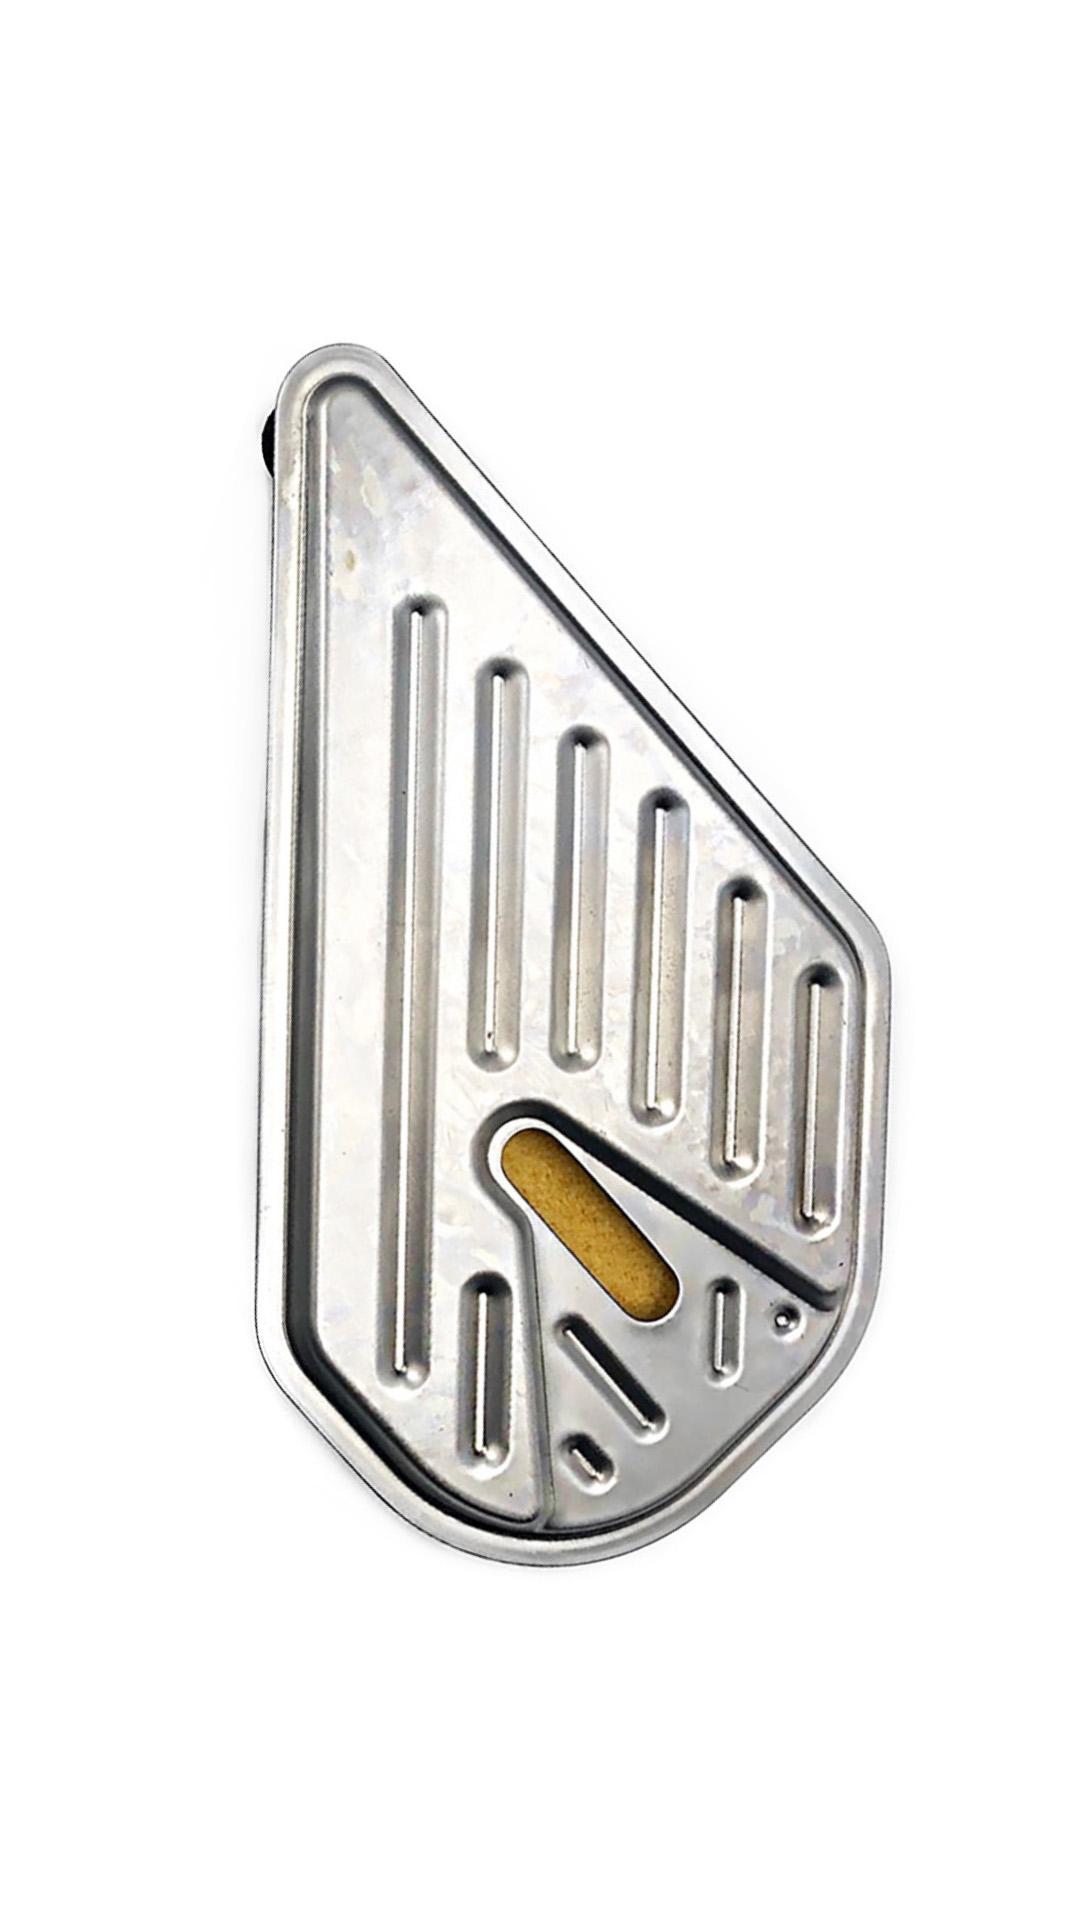 Filtro de Óleo - Câmbio TH125 | 3T40 - Chevrolet | GM